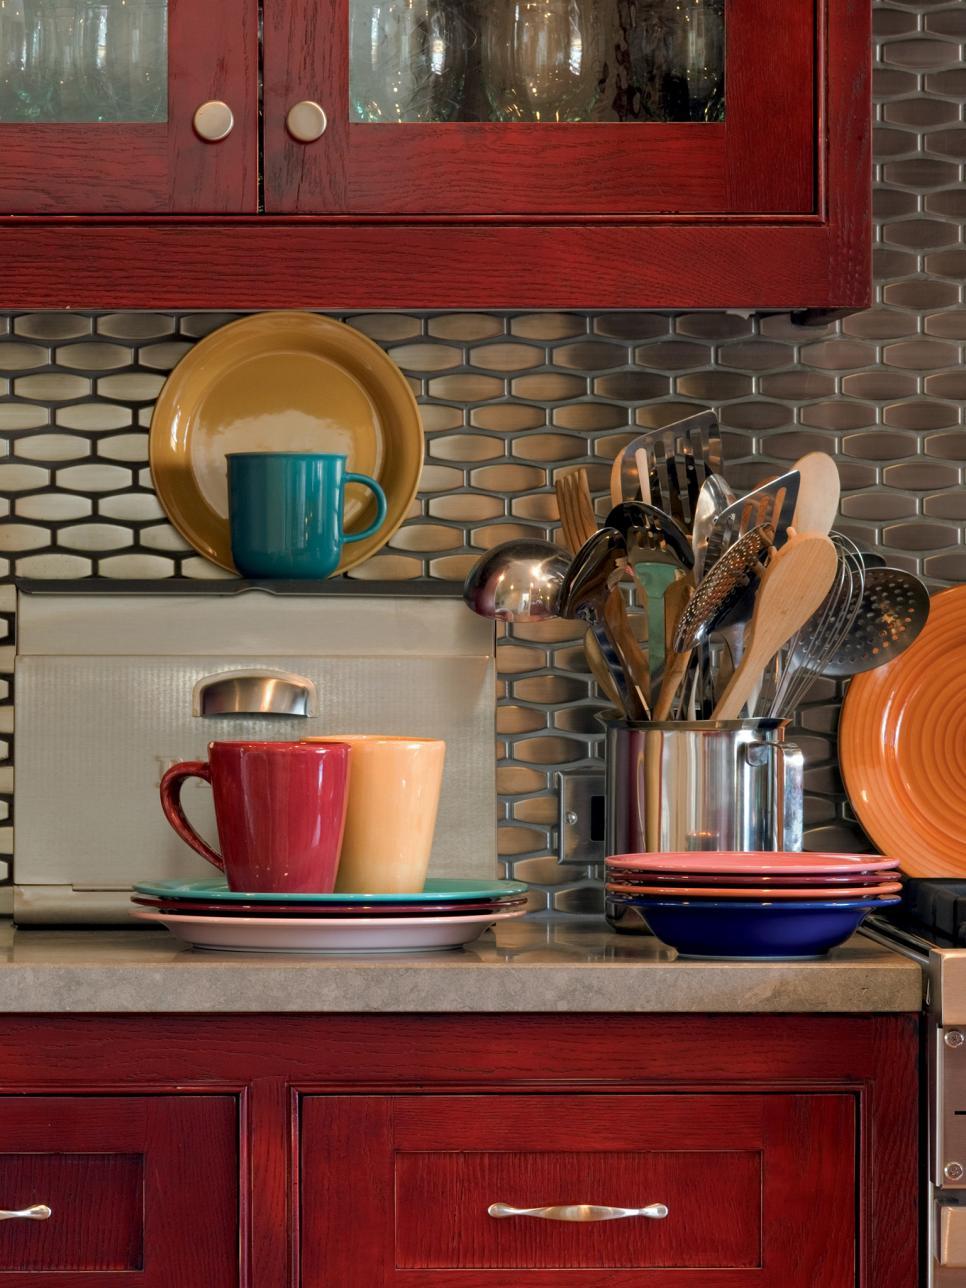 Creative kitchen splashback made of stainless steel